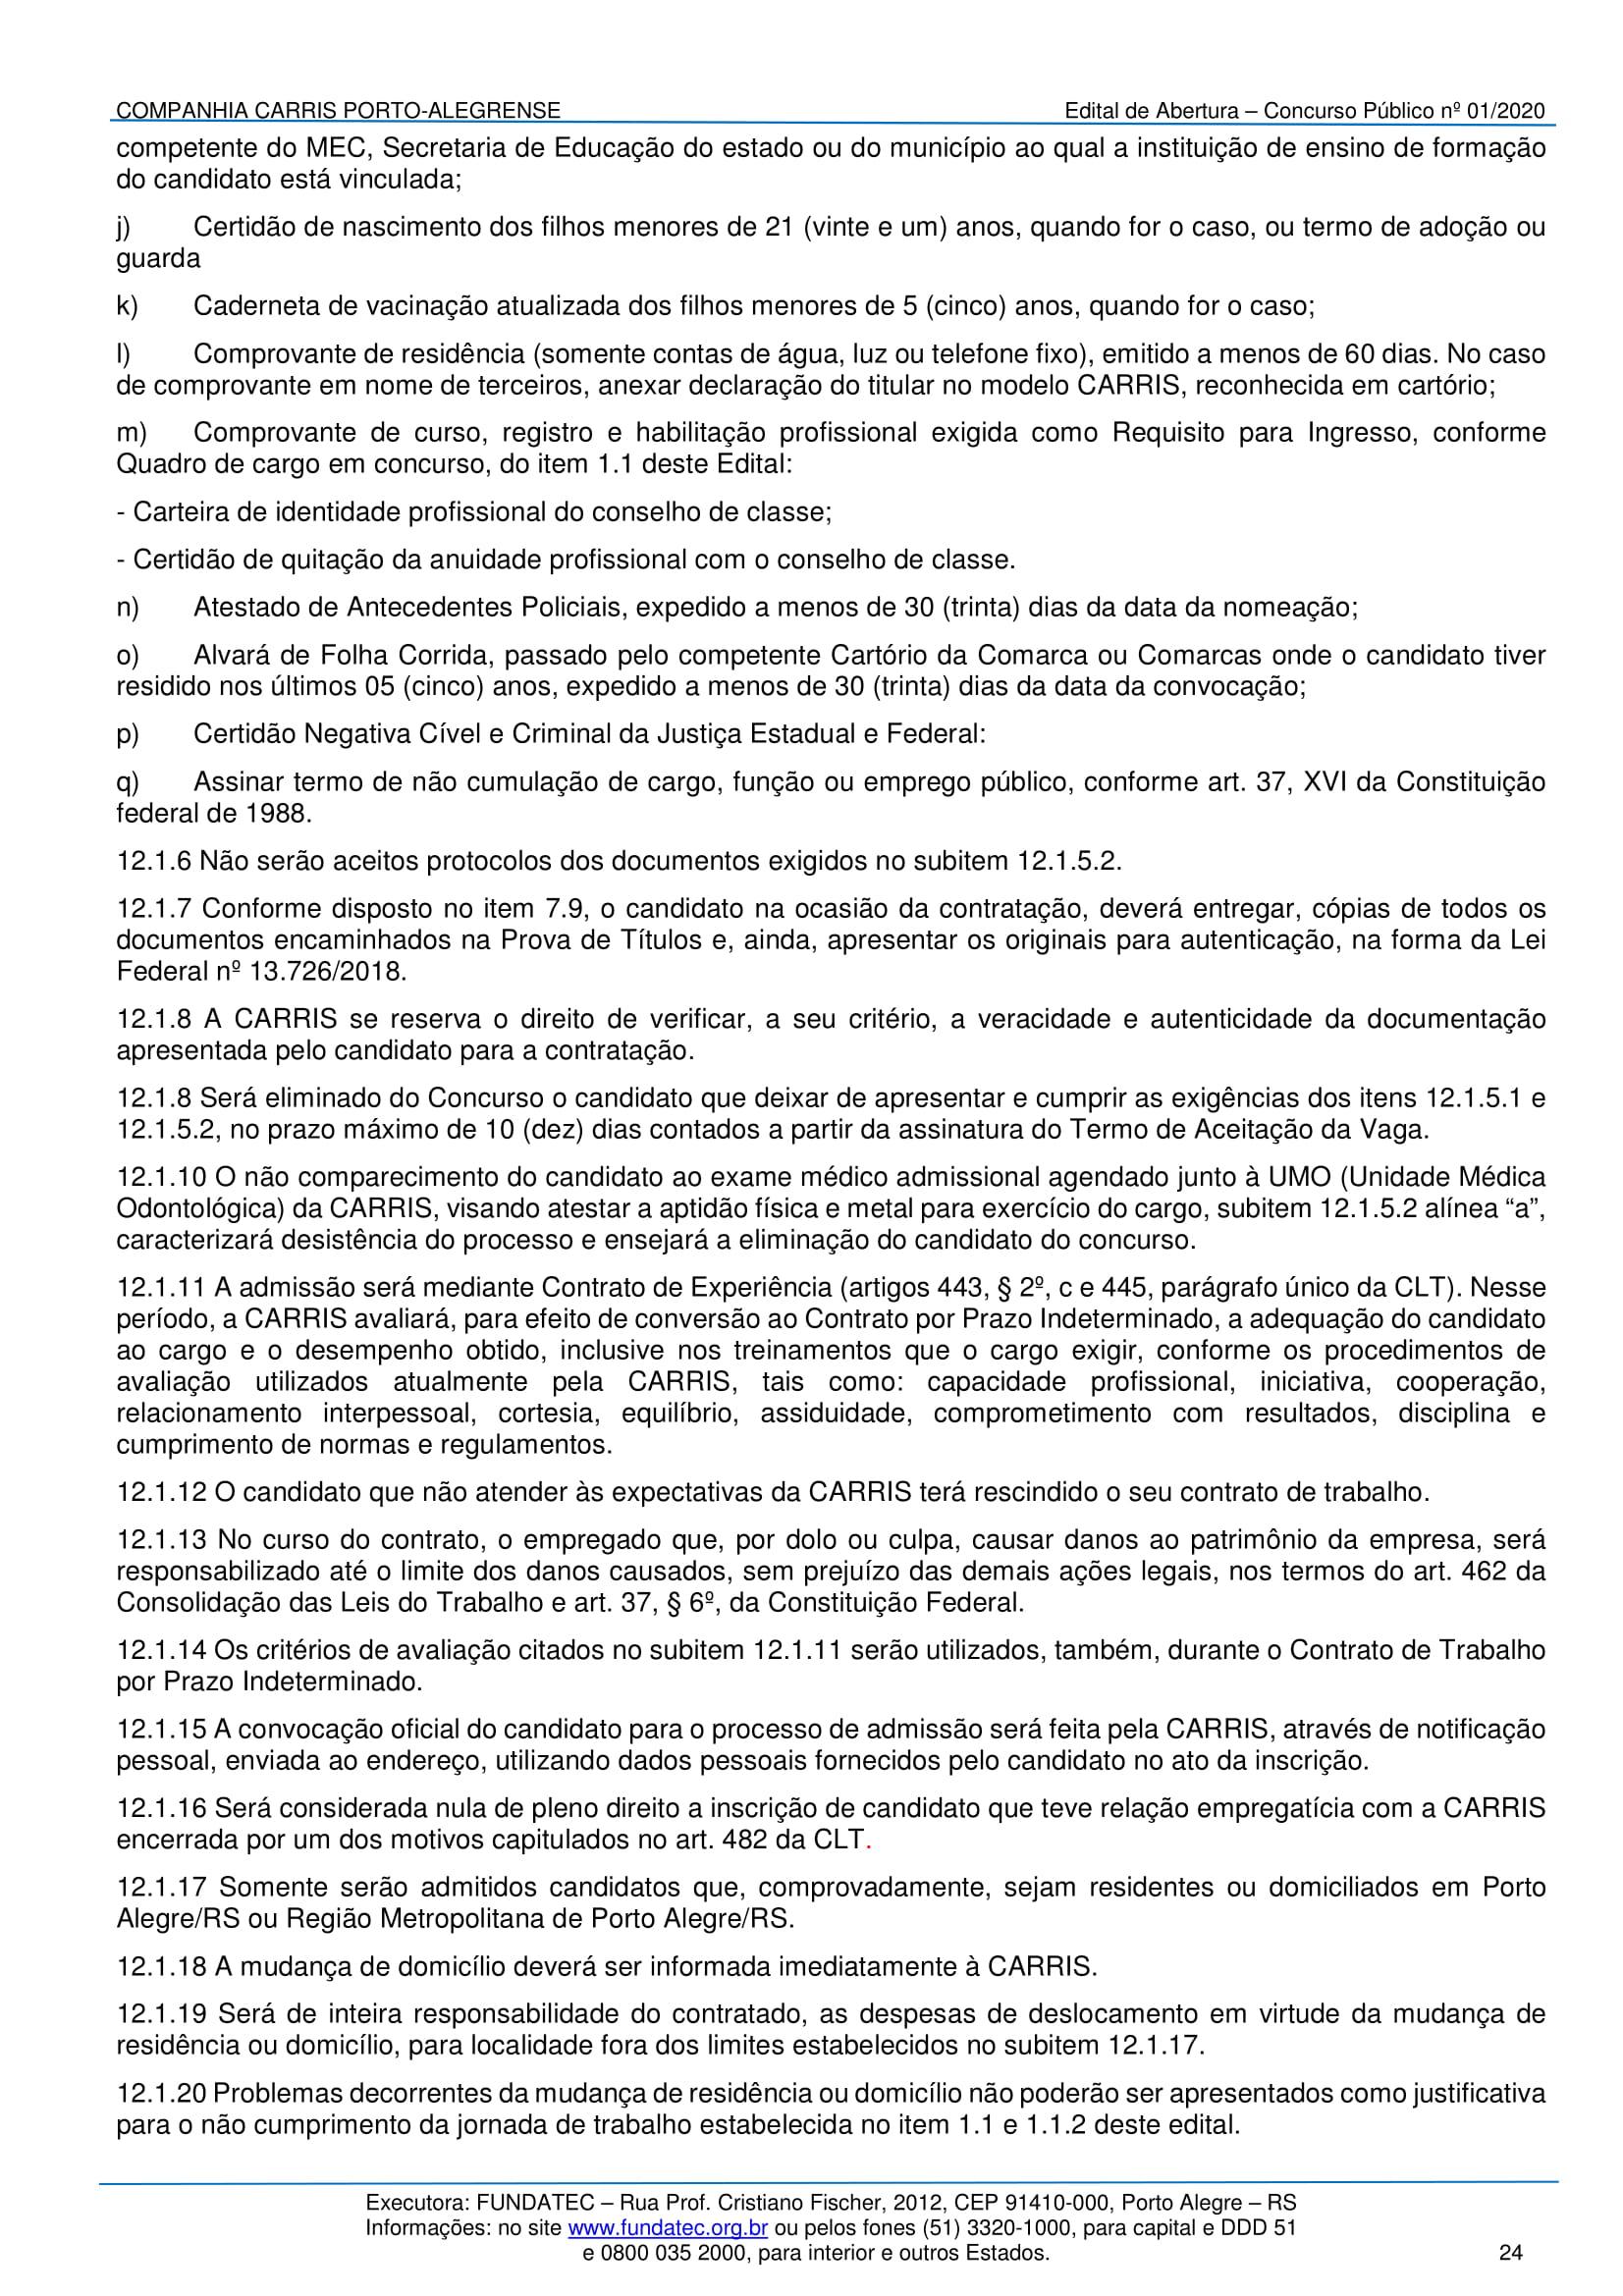 auditor-24